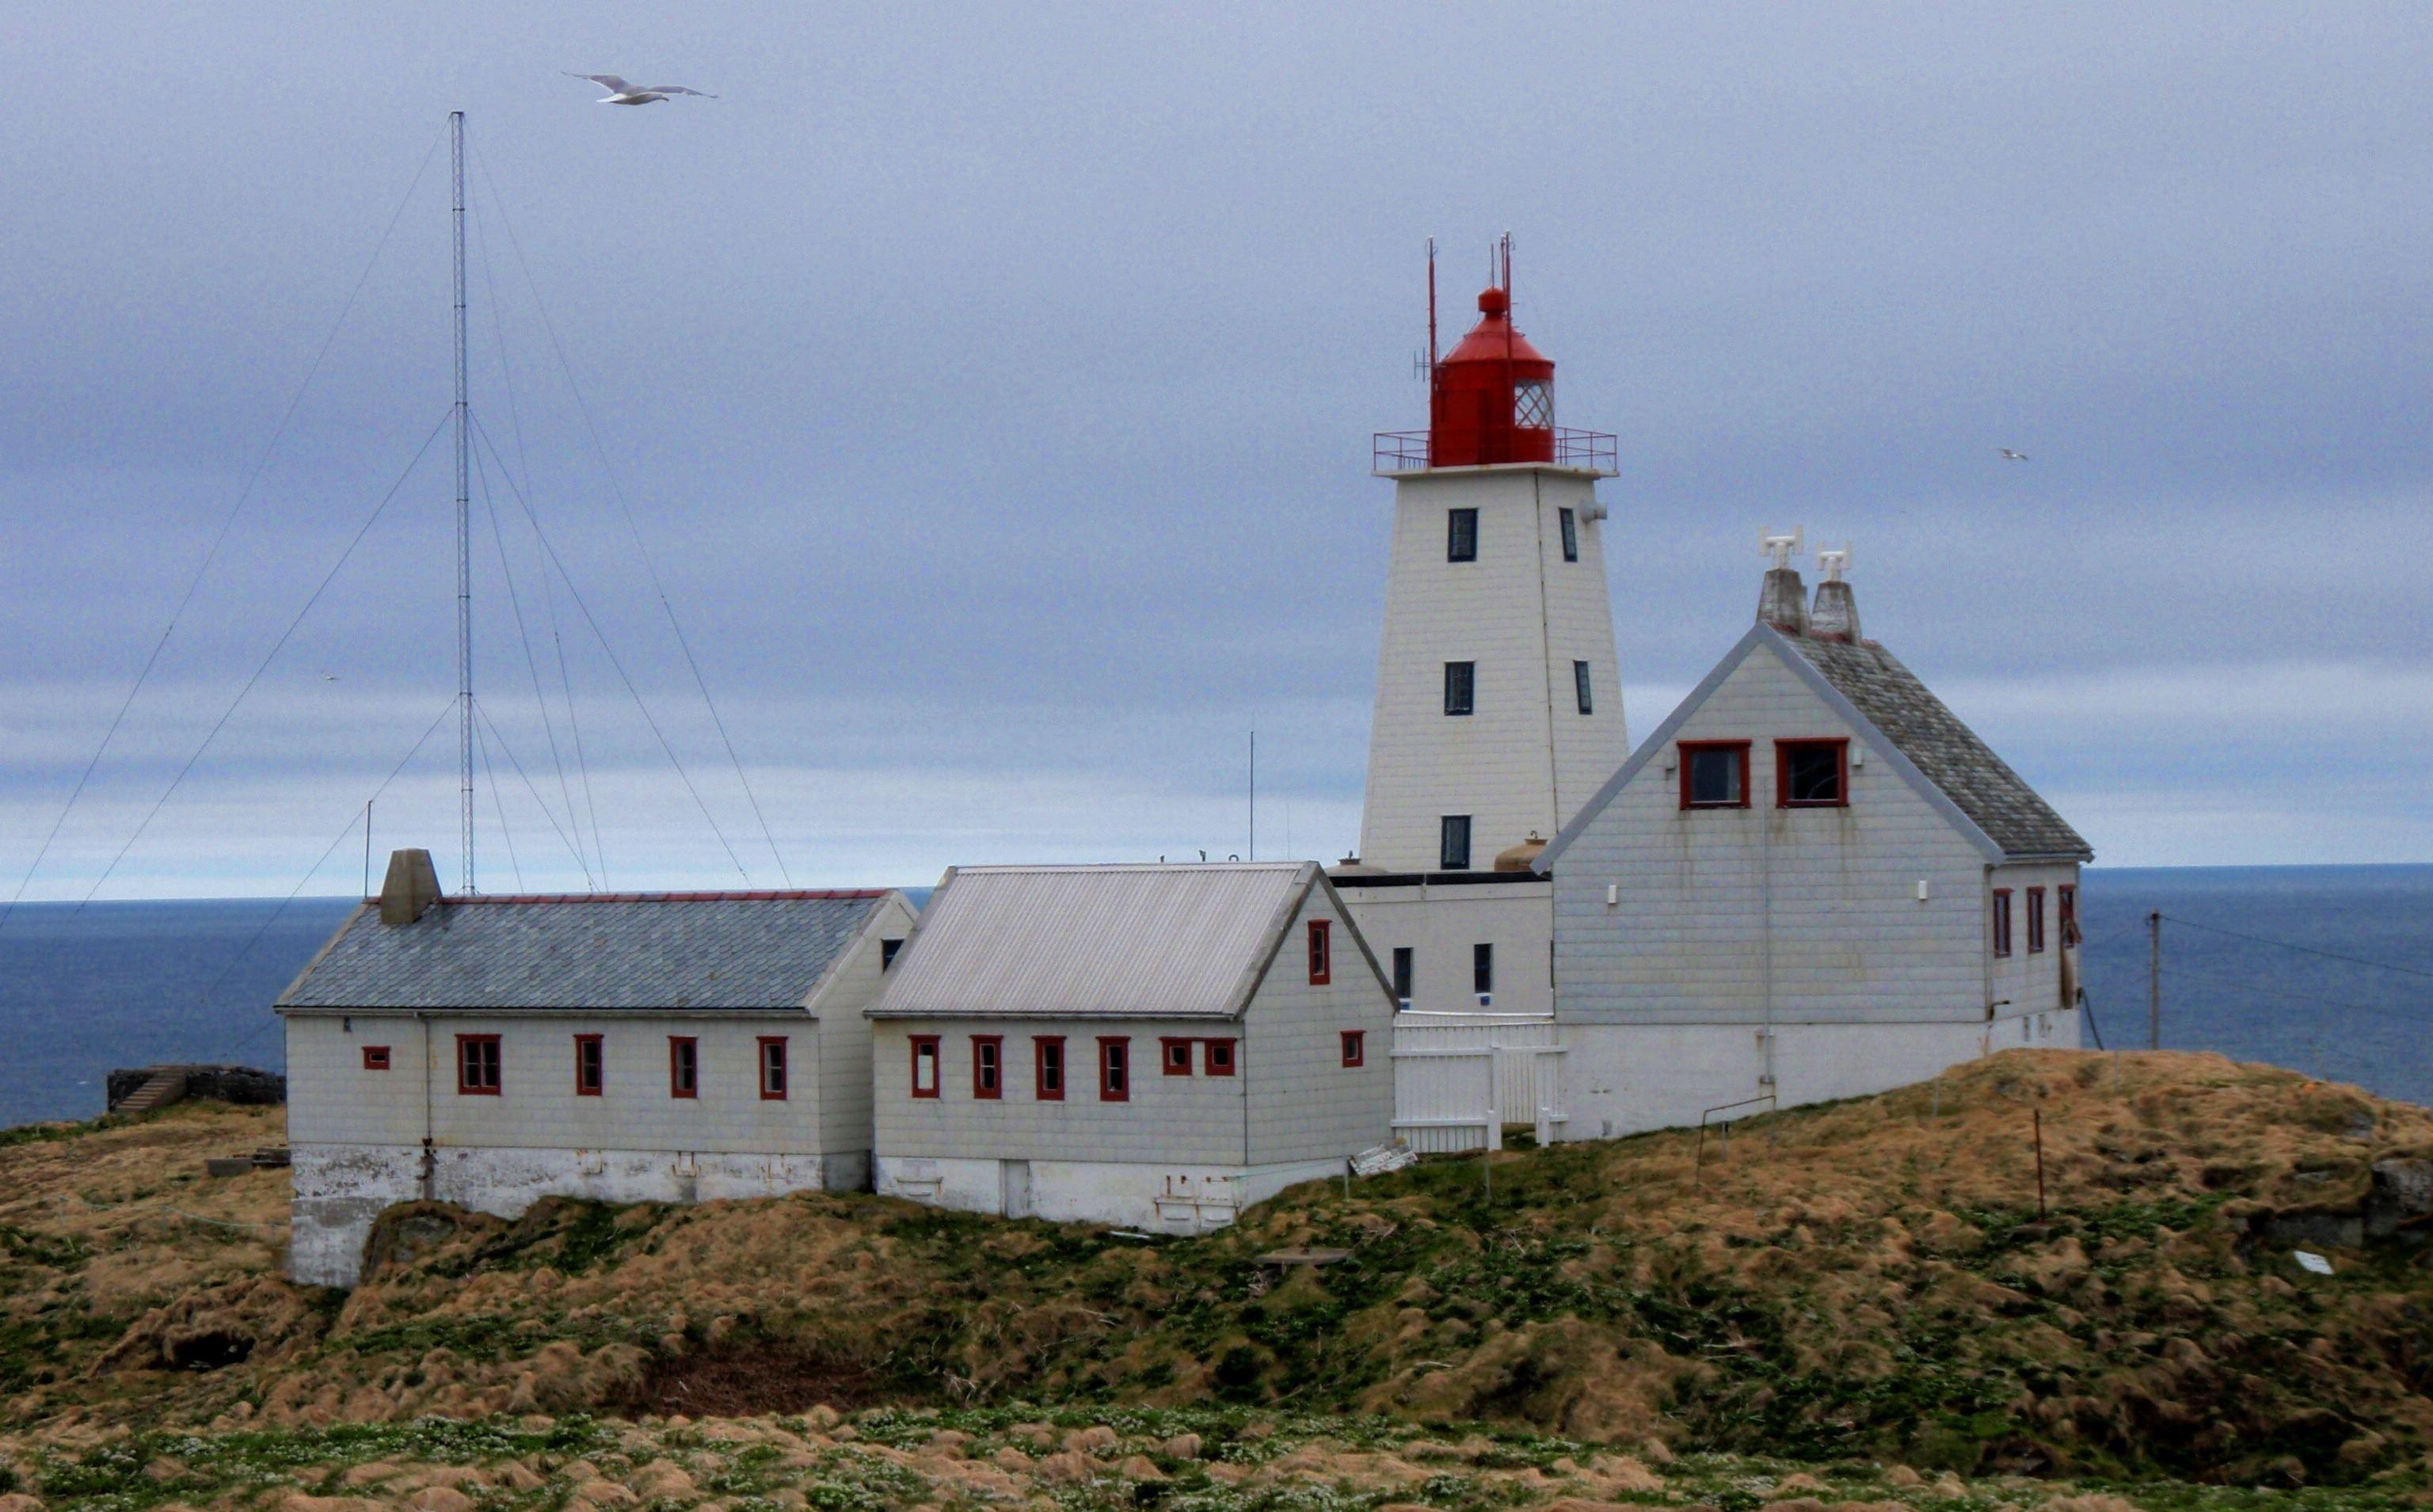 Hornøya /Vardø light house